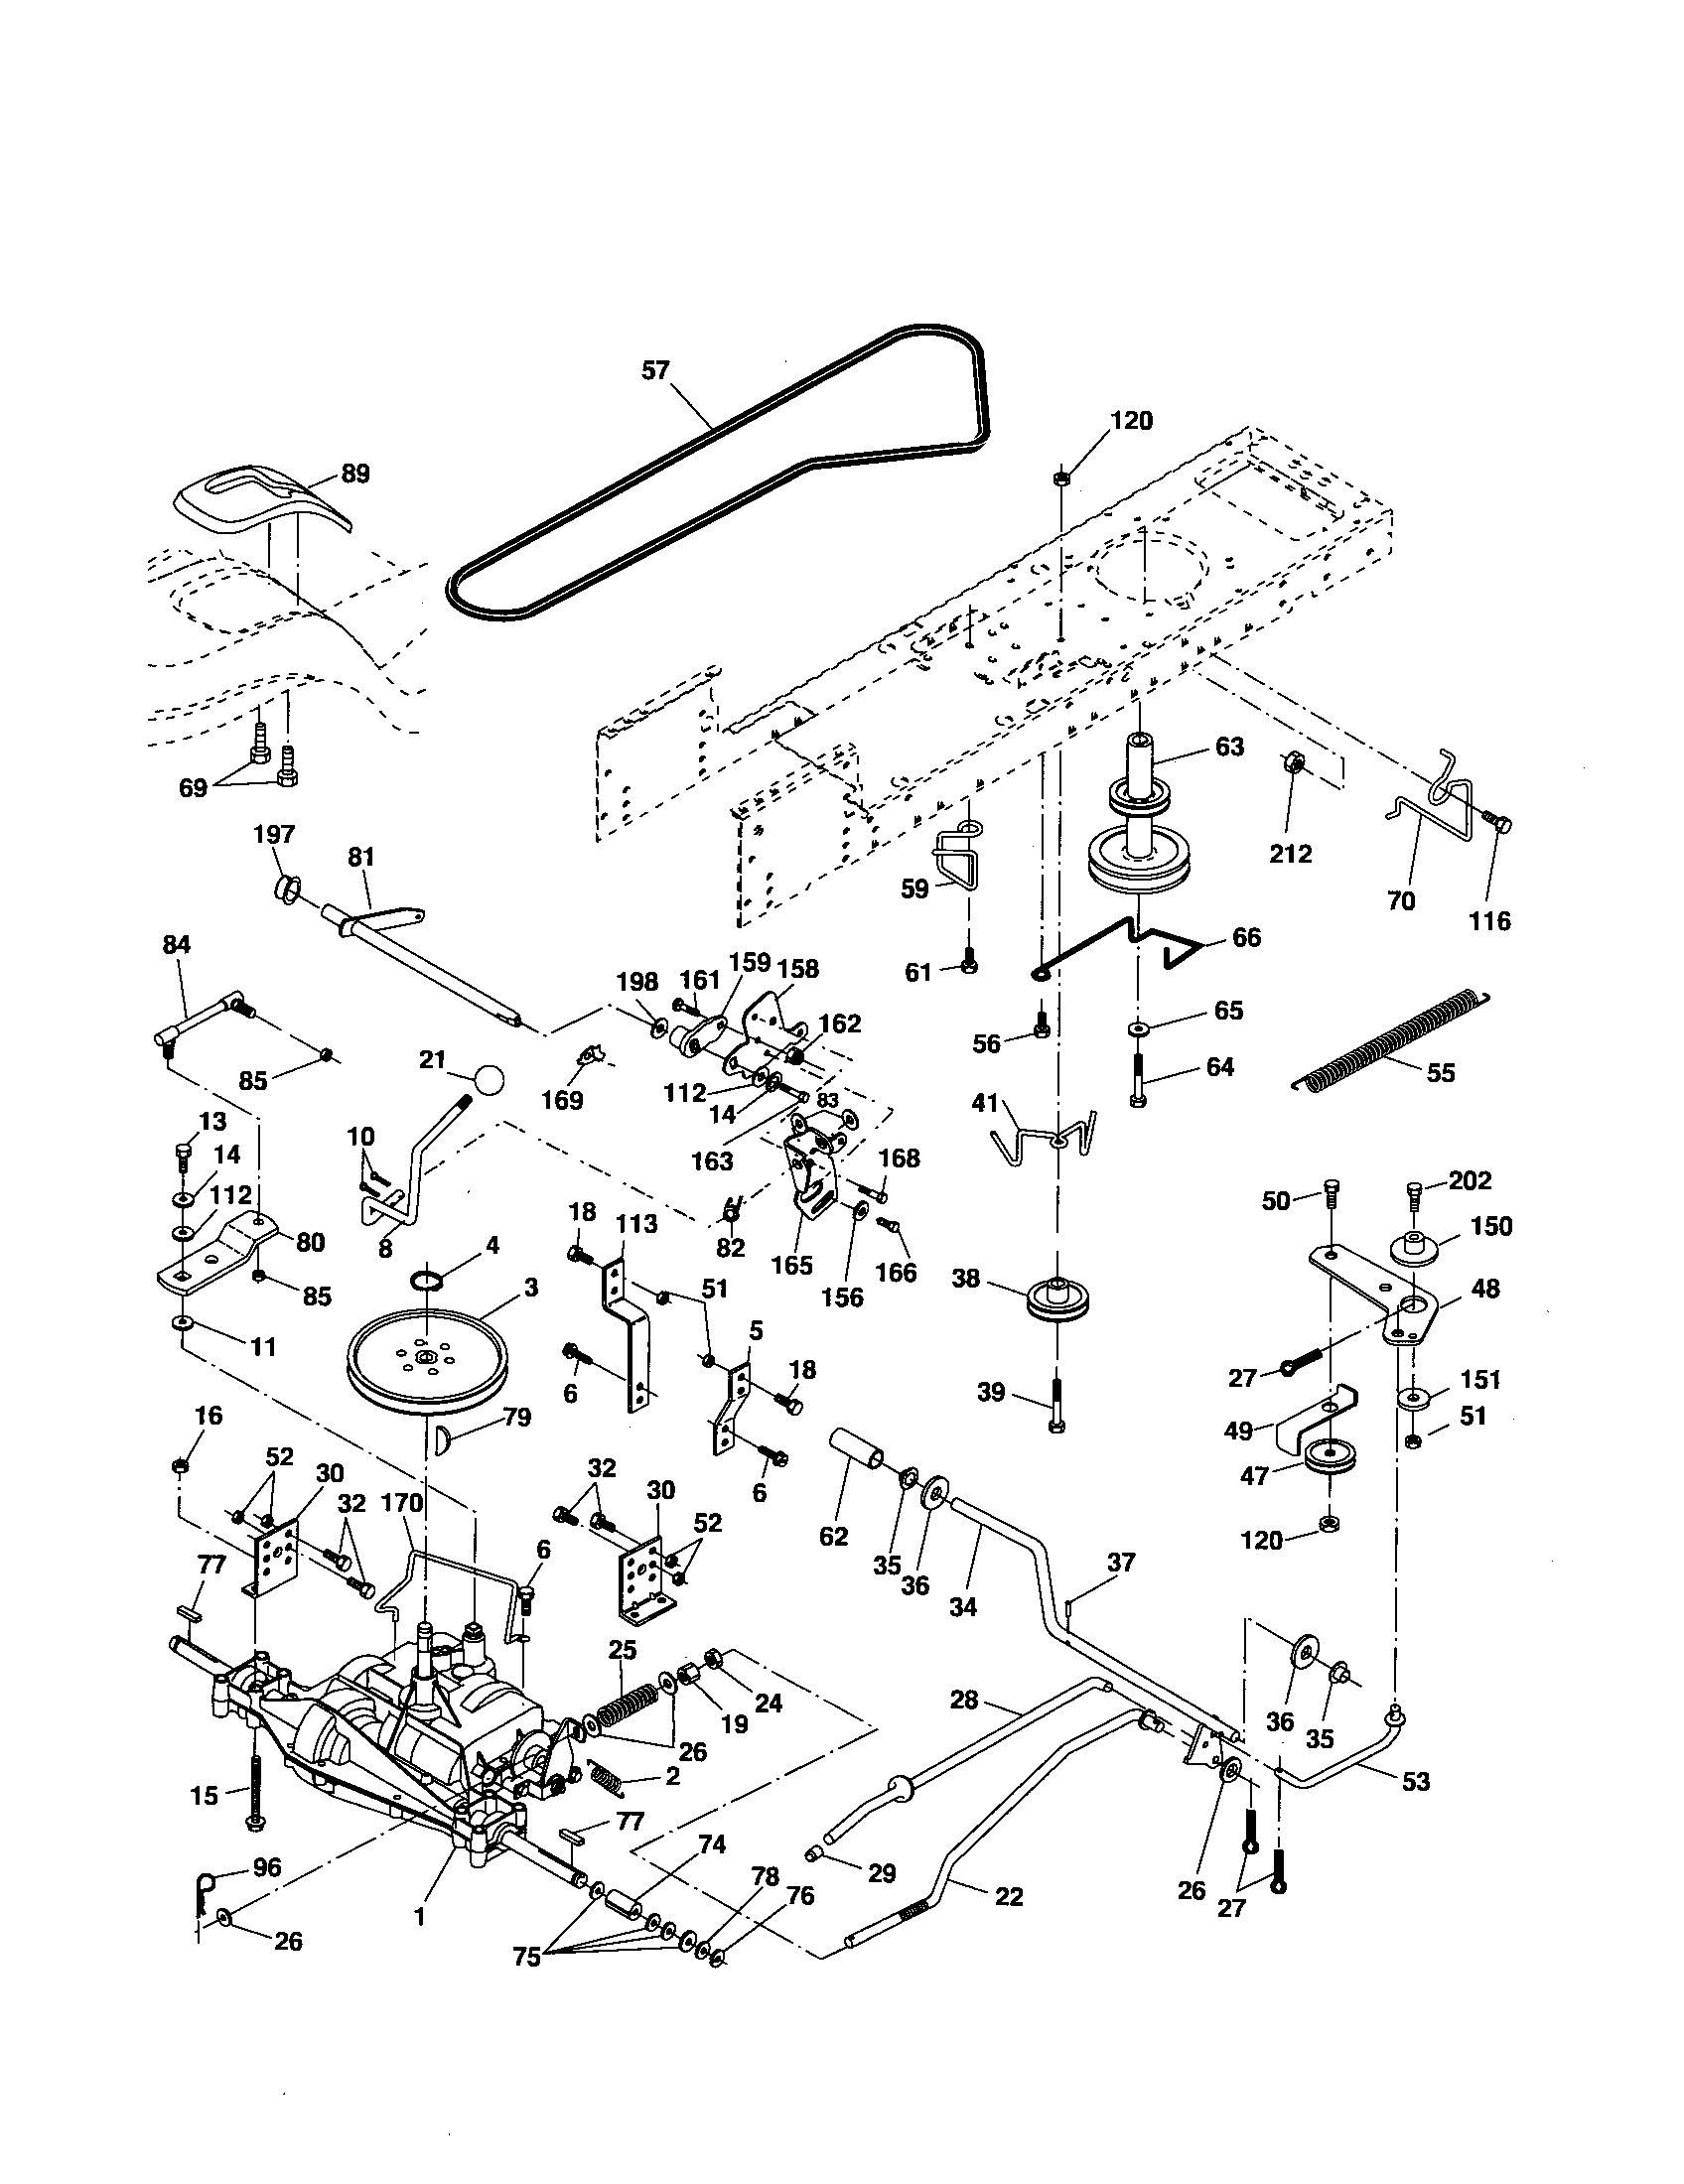 Toro Wheel Horse Wiring Diagram on